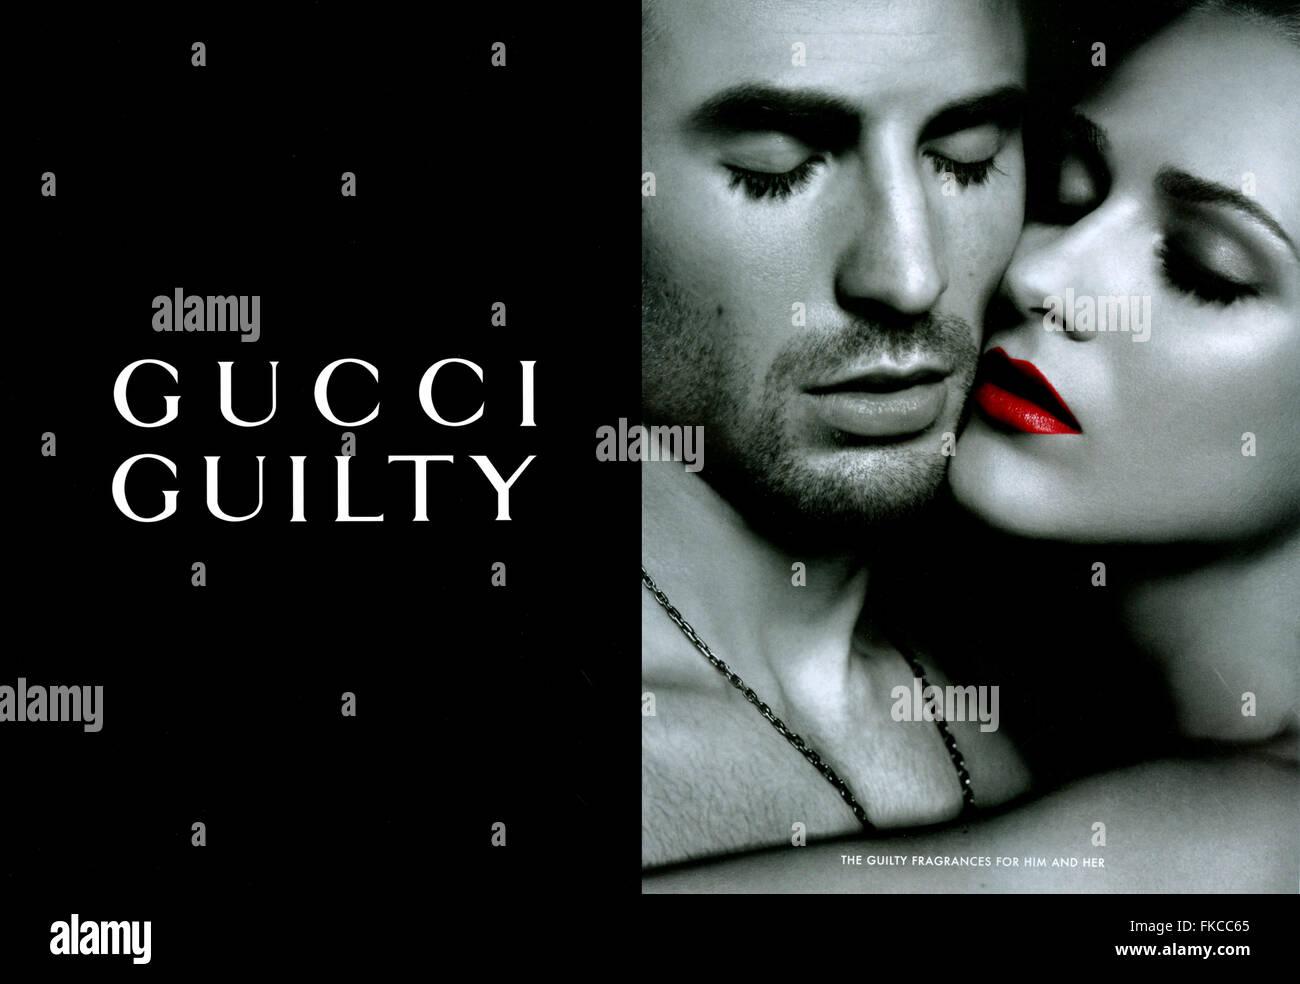 7f6bc36502c6 2010er Jahre UK Gucci Magazin Anzeige Stockfoto, Bild  98003309 - Alamy